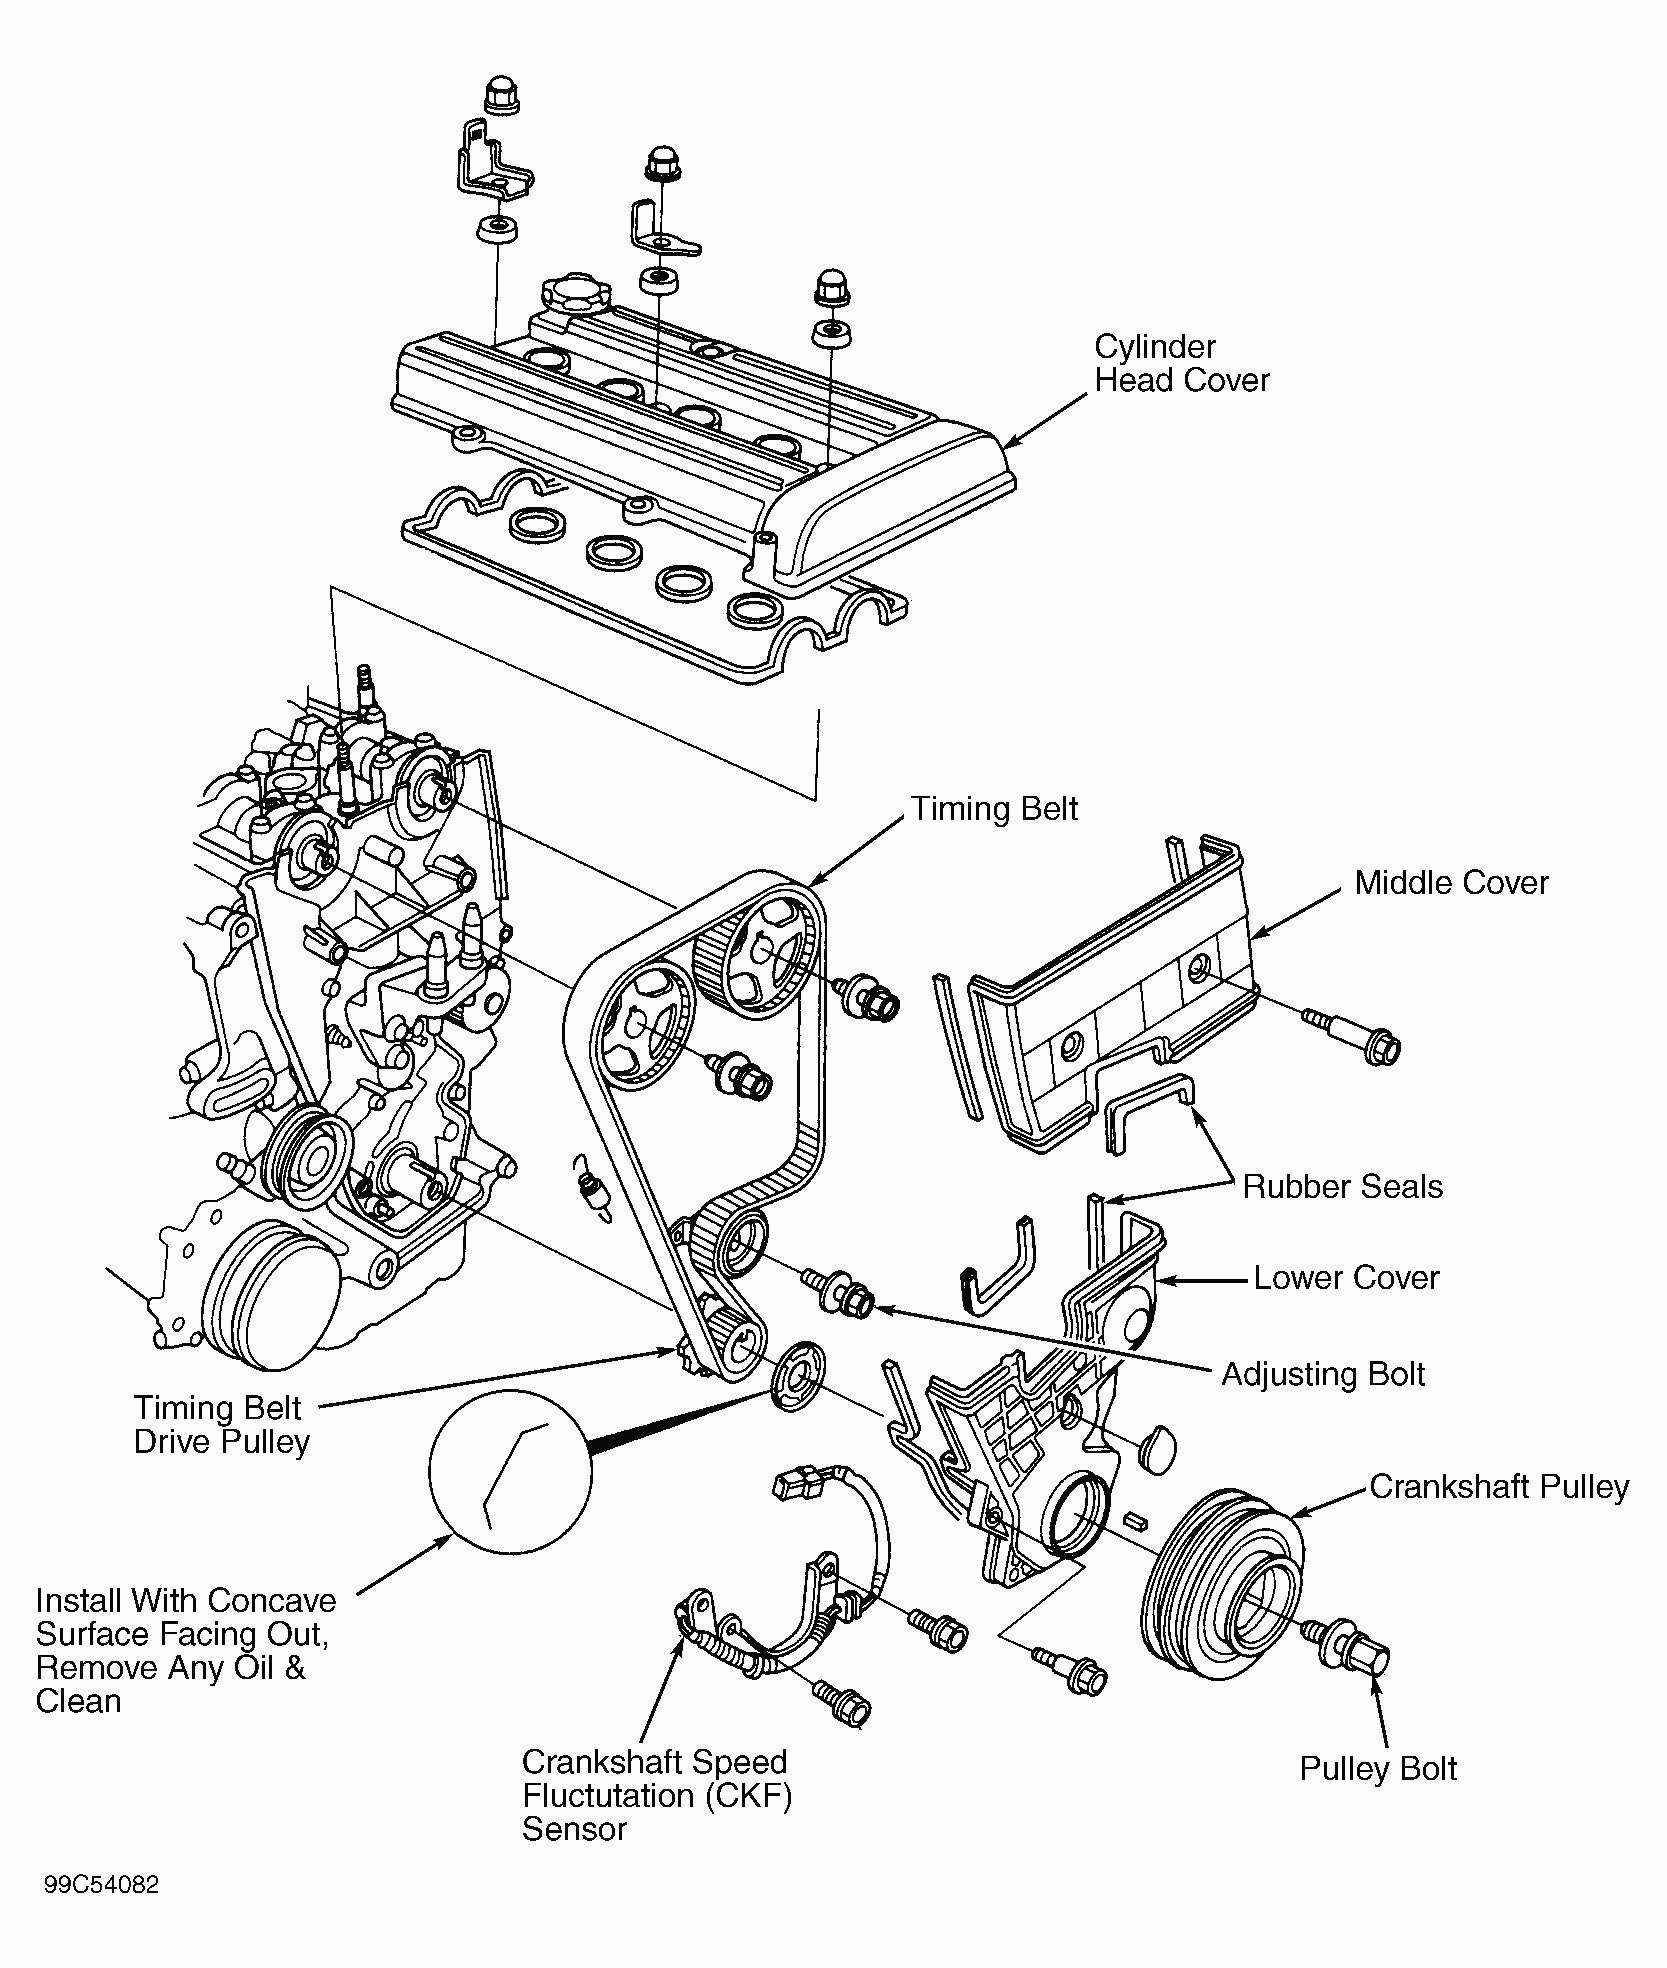 [DIAGRAM_09CH]  WT_6613] Diagram For Honda Crv 2005 Serpentine Belt 2005 Honda Crv Schematic  Wiring   2004 Honda Cr V Engine Diagram      Hist Monoc Eumqu Olyti Kapemie Mohammedshrine Librar Wiring 101